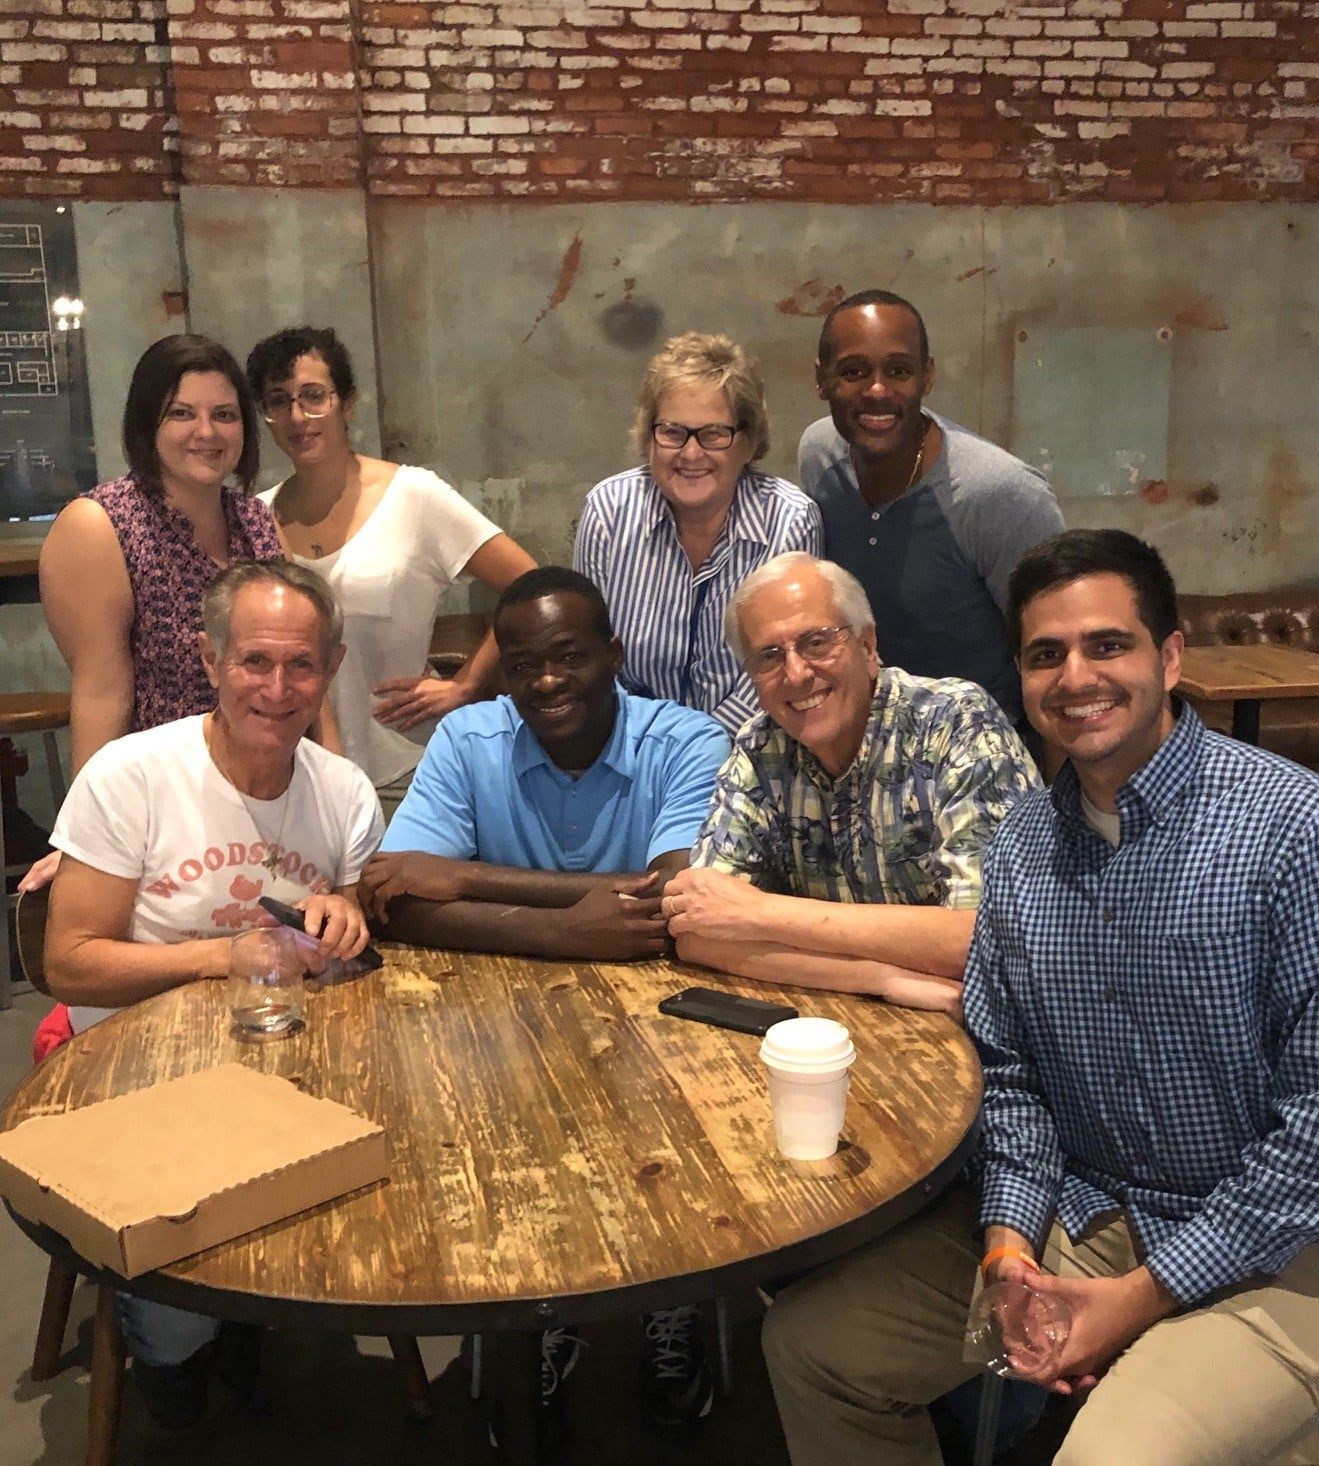 JB Bernstein and Outreach Team in Ybor City